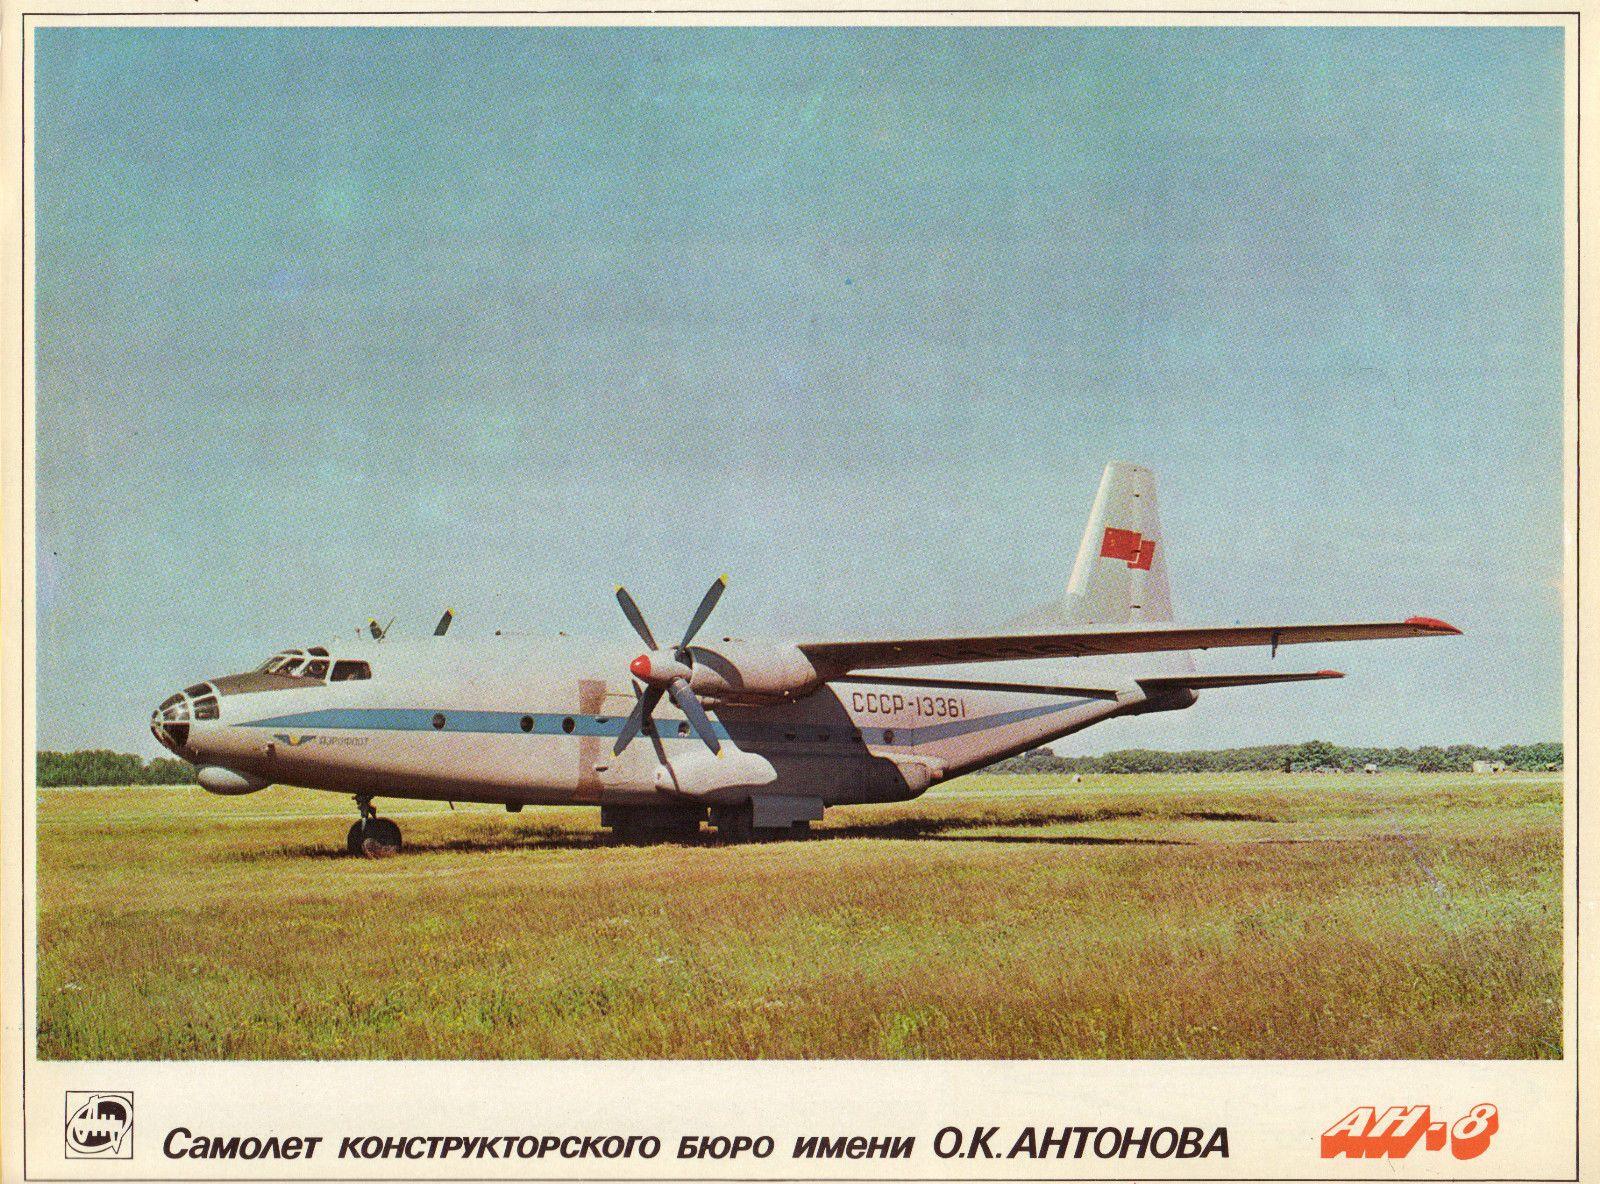 An-8 CCCP-13361.jpg